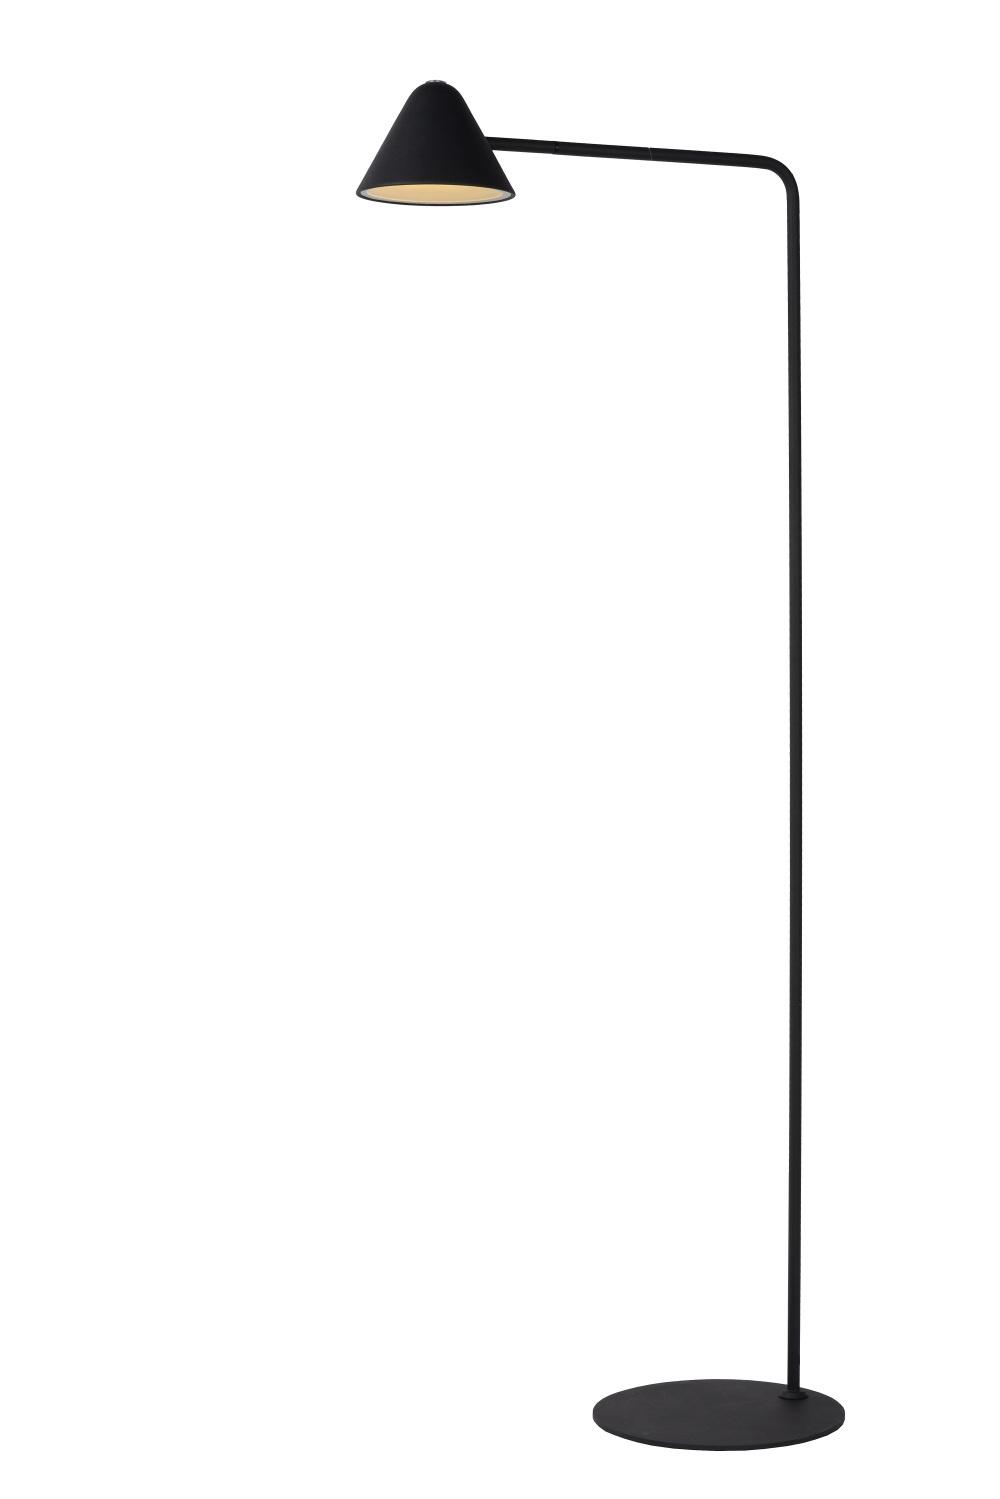 Lucide DEVON Leeslamp 3W / LED H129,5m Zwart